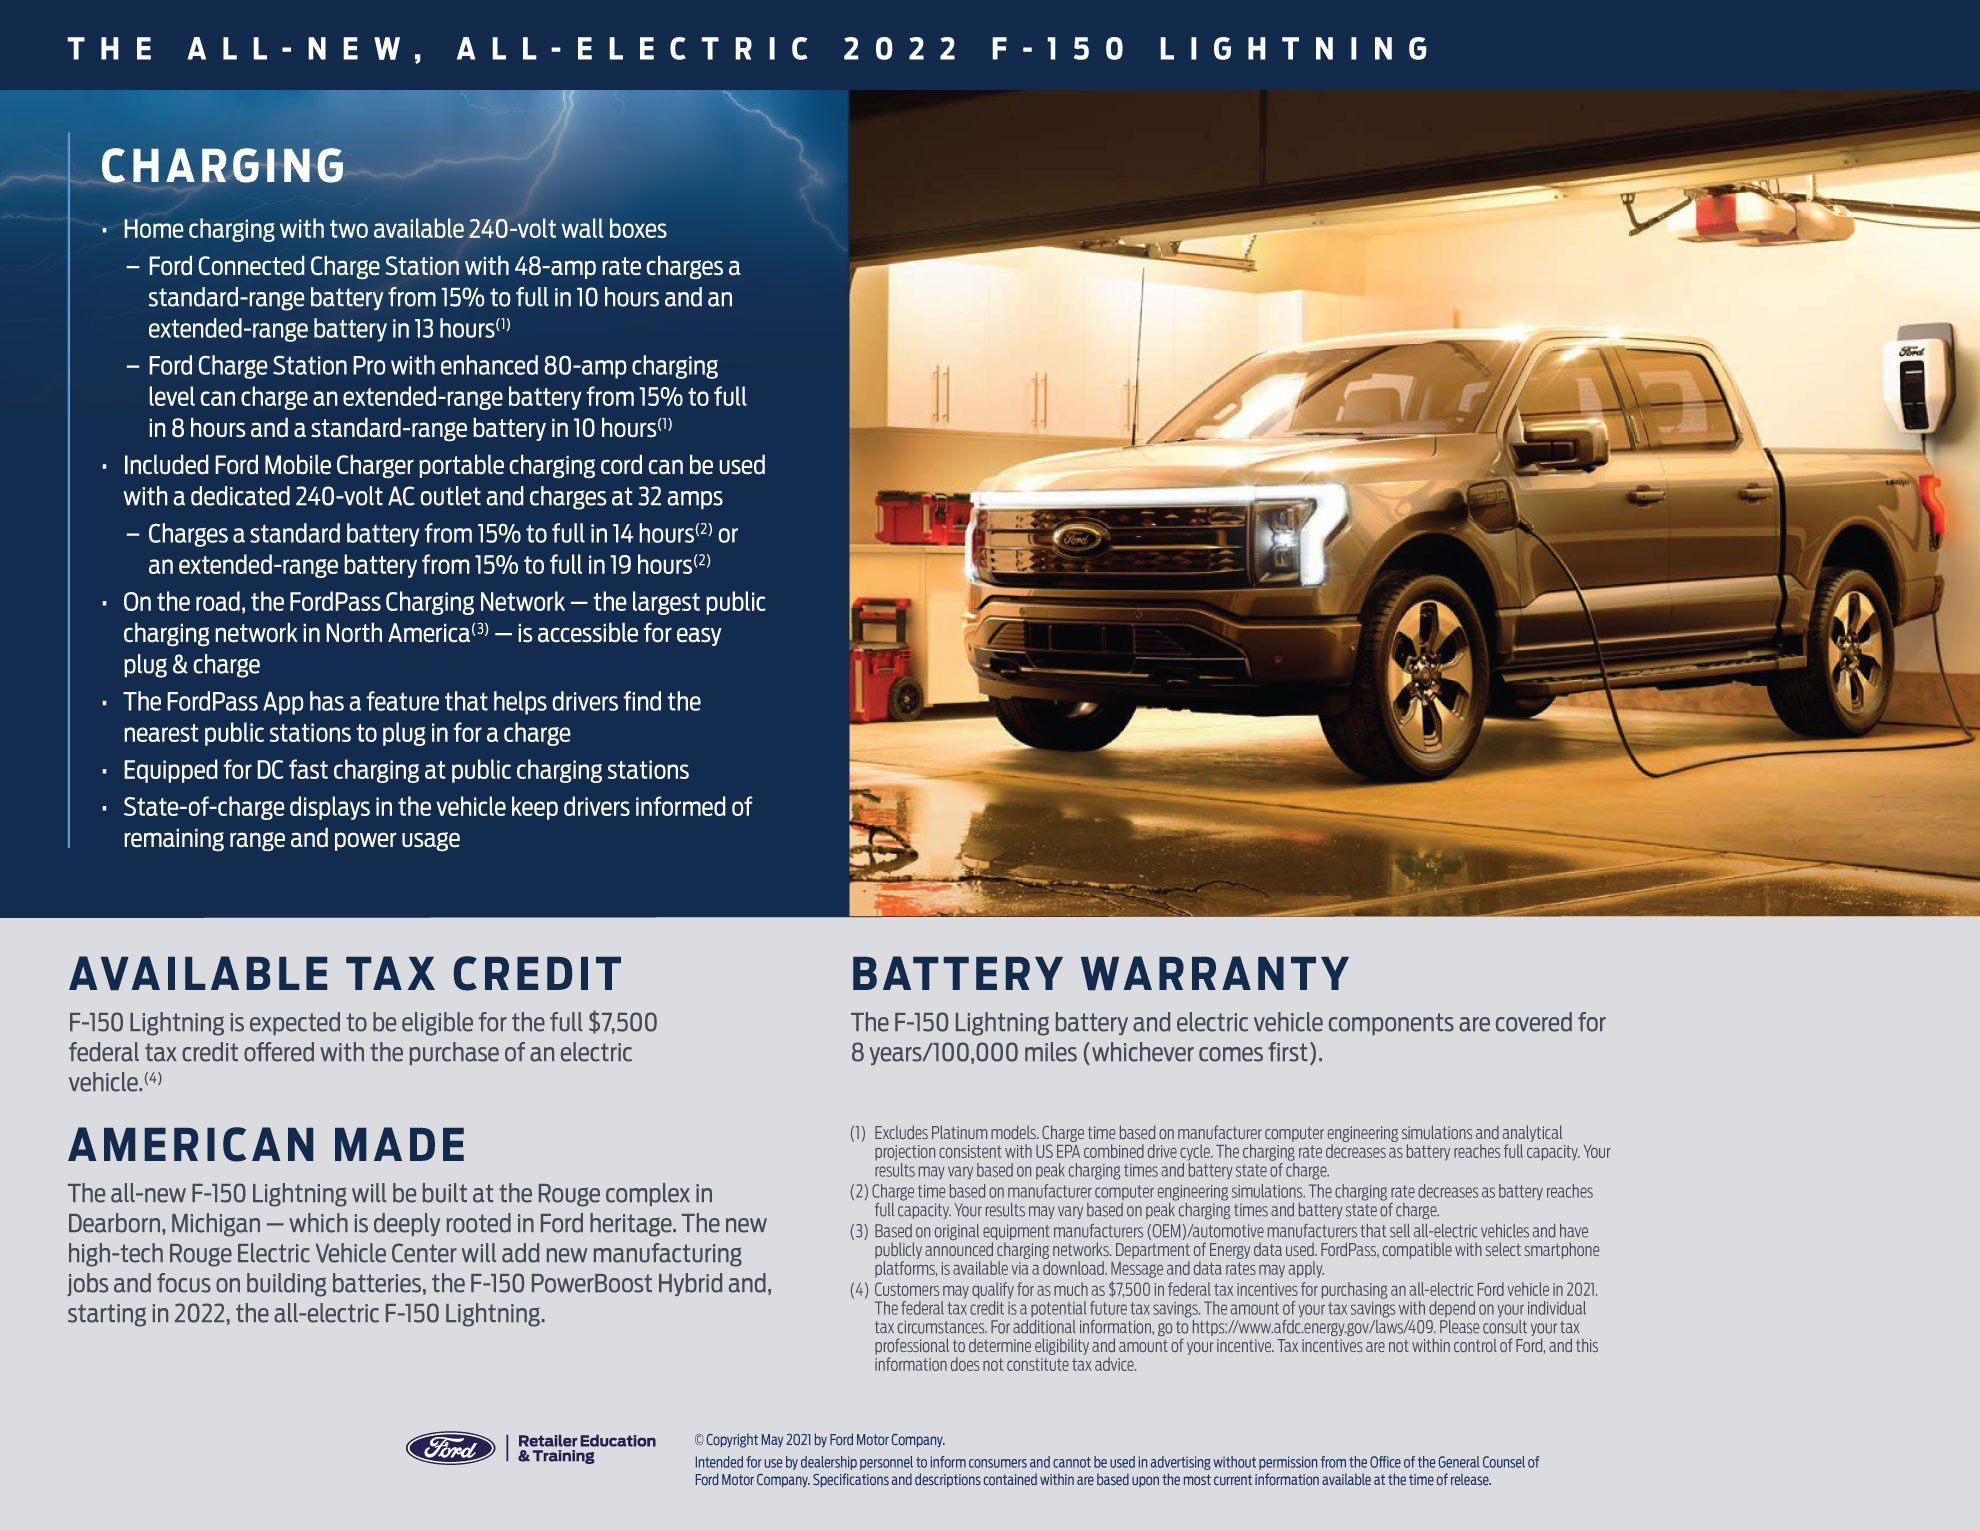 Ford F-150 Lightning Battery